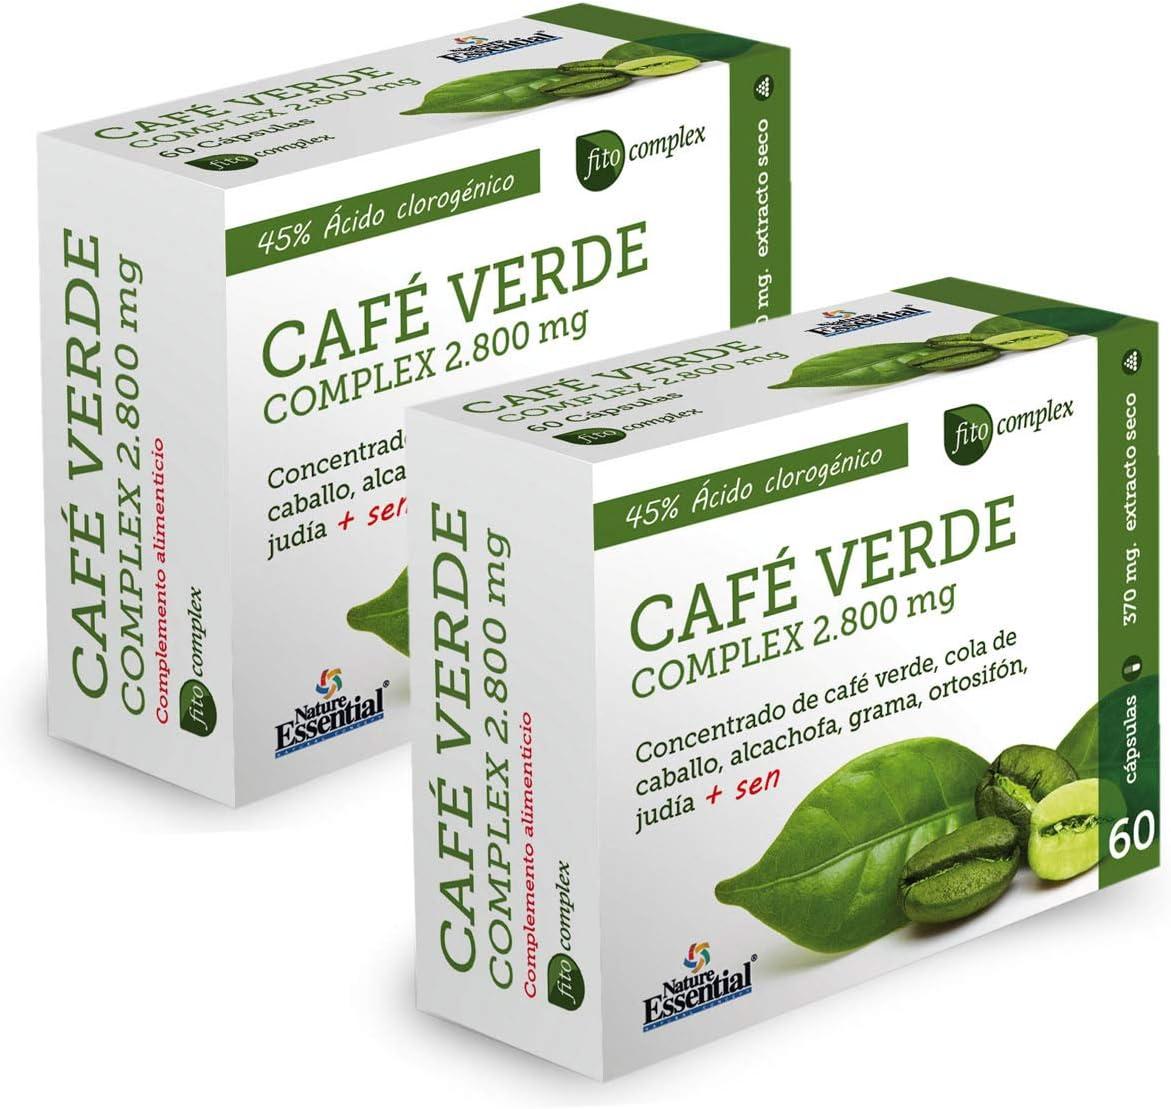 Café verde 2800 mg. (complex) 60 capsulas (Pack 2 unid.)